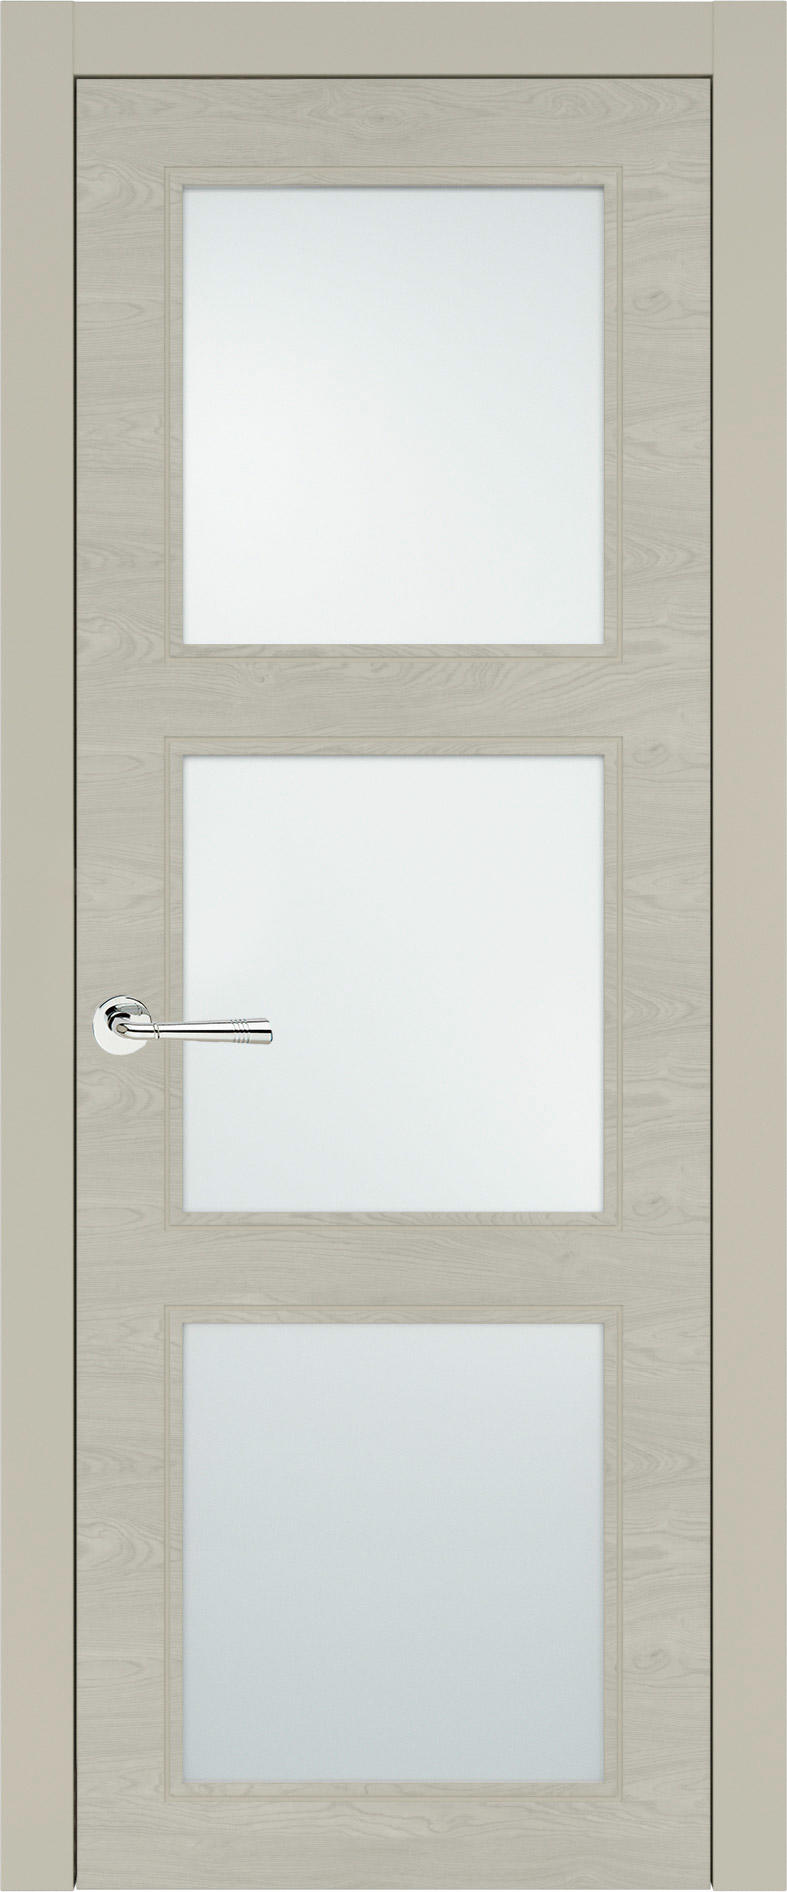 Milano Neo Classic цвет - Серо-оливковая эмаль по шпону (RAL 7032) Со стеклом (ДО)